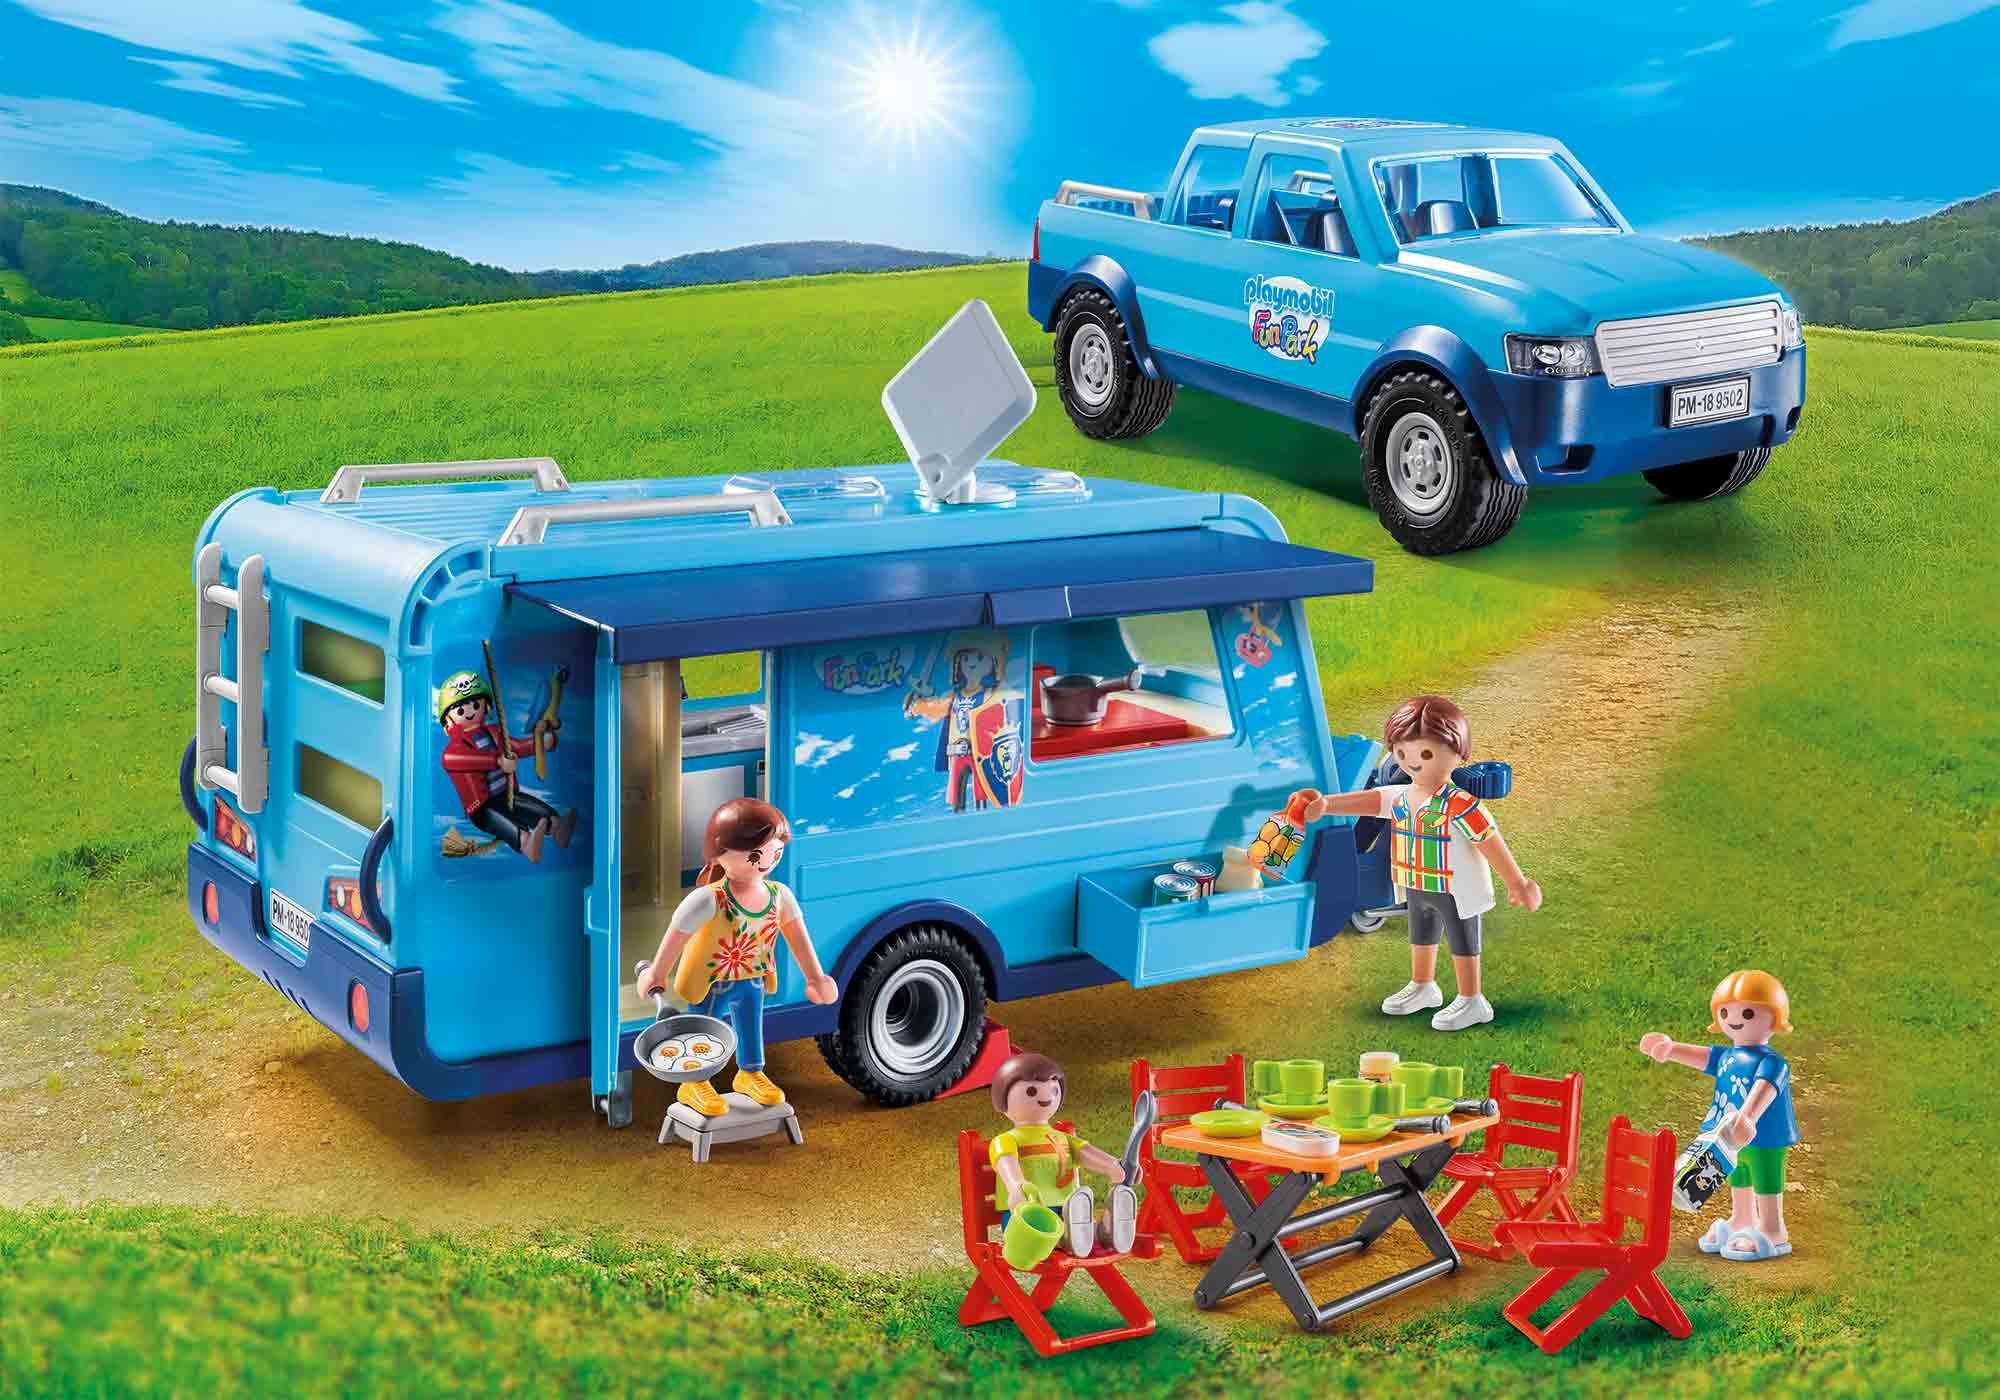 9502_product_detail/PLAYMOBIL Pickup with Caravan